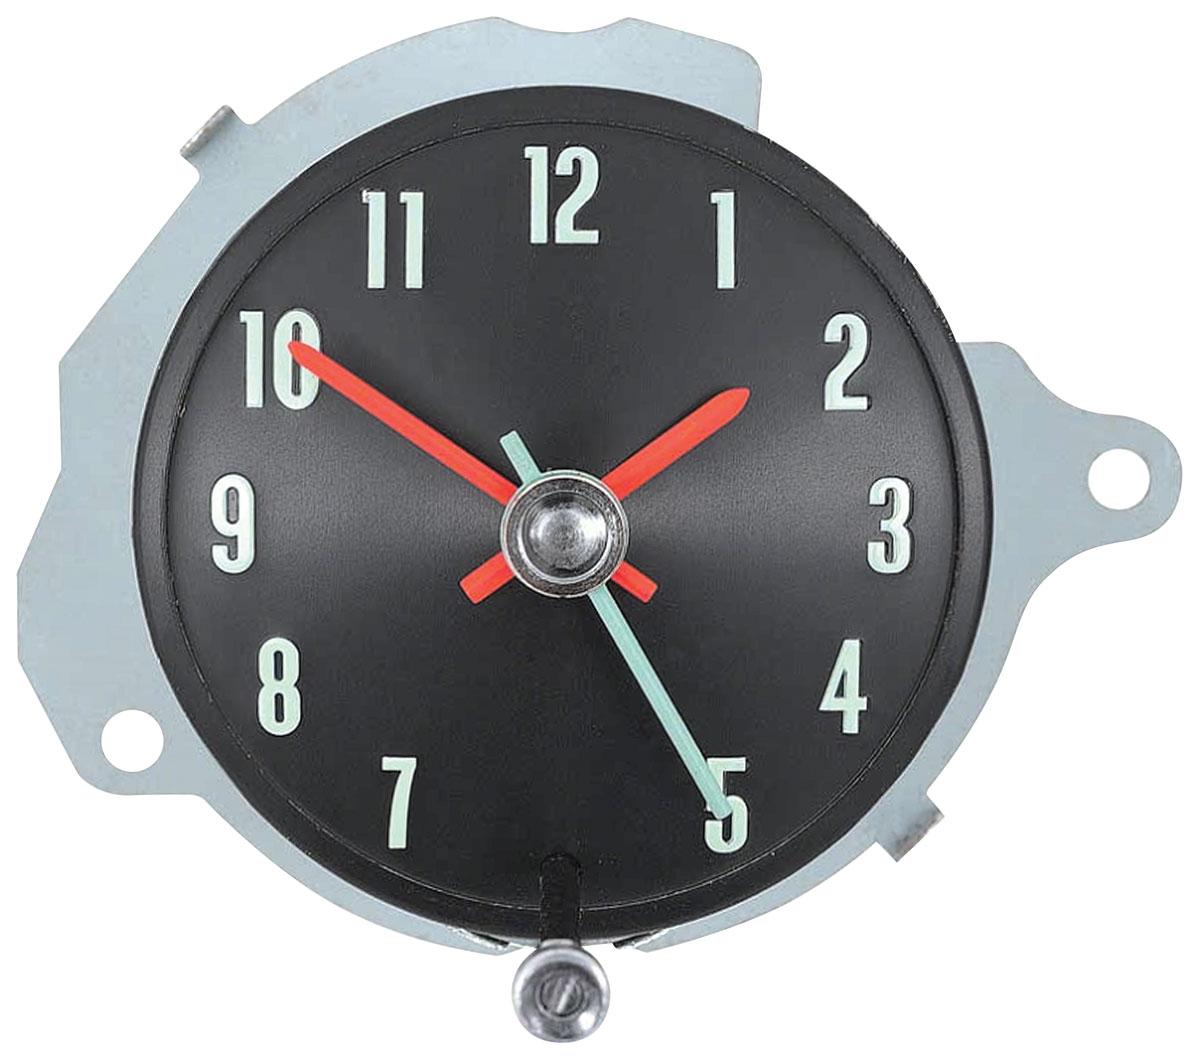 Clock, 1968 Chevelle/El Camino, In Dash, w/ Warning Lights